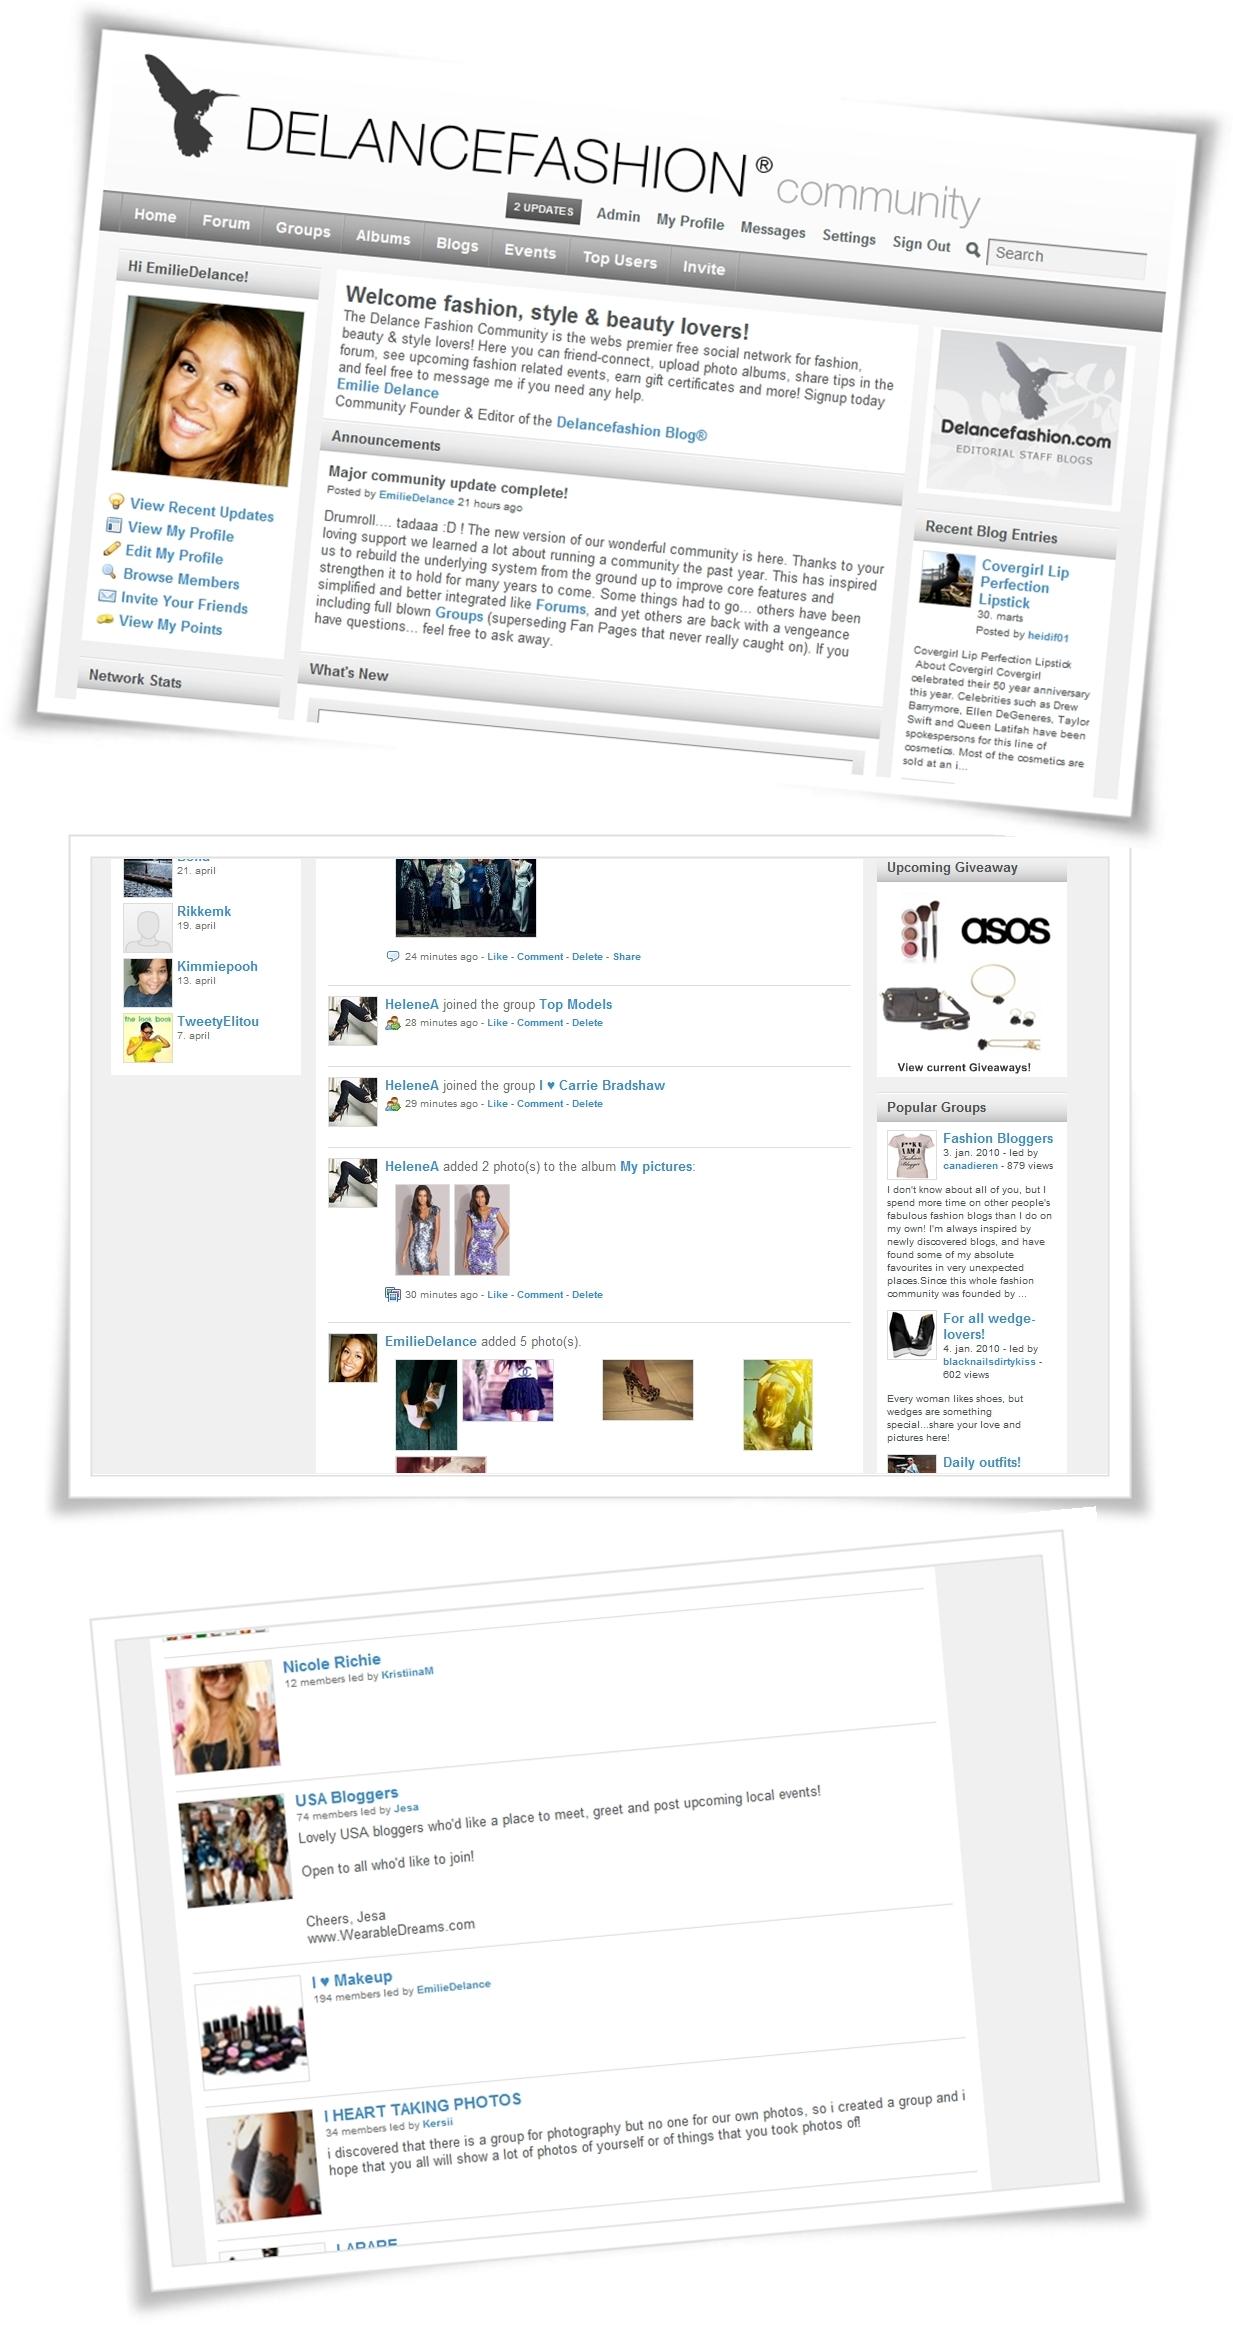 fashion community, delancefashion community